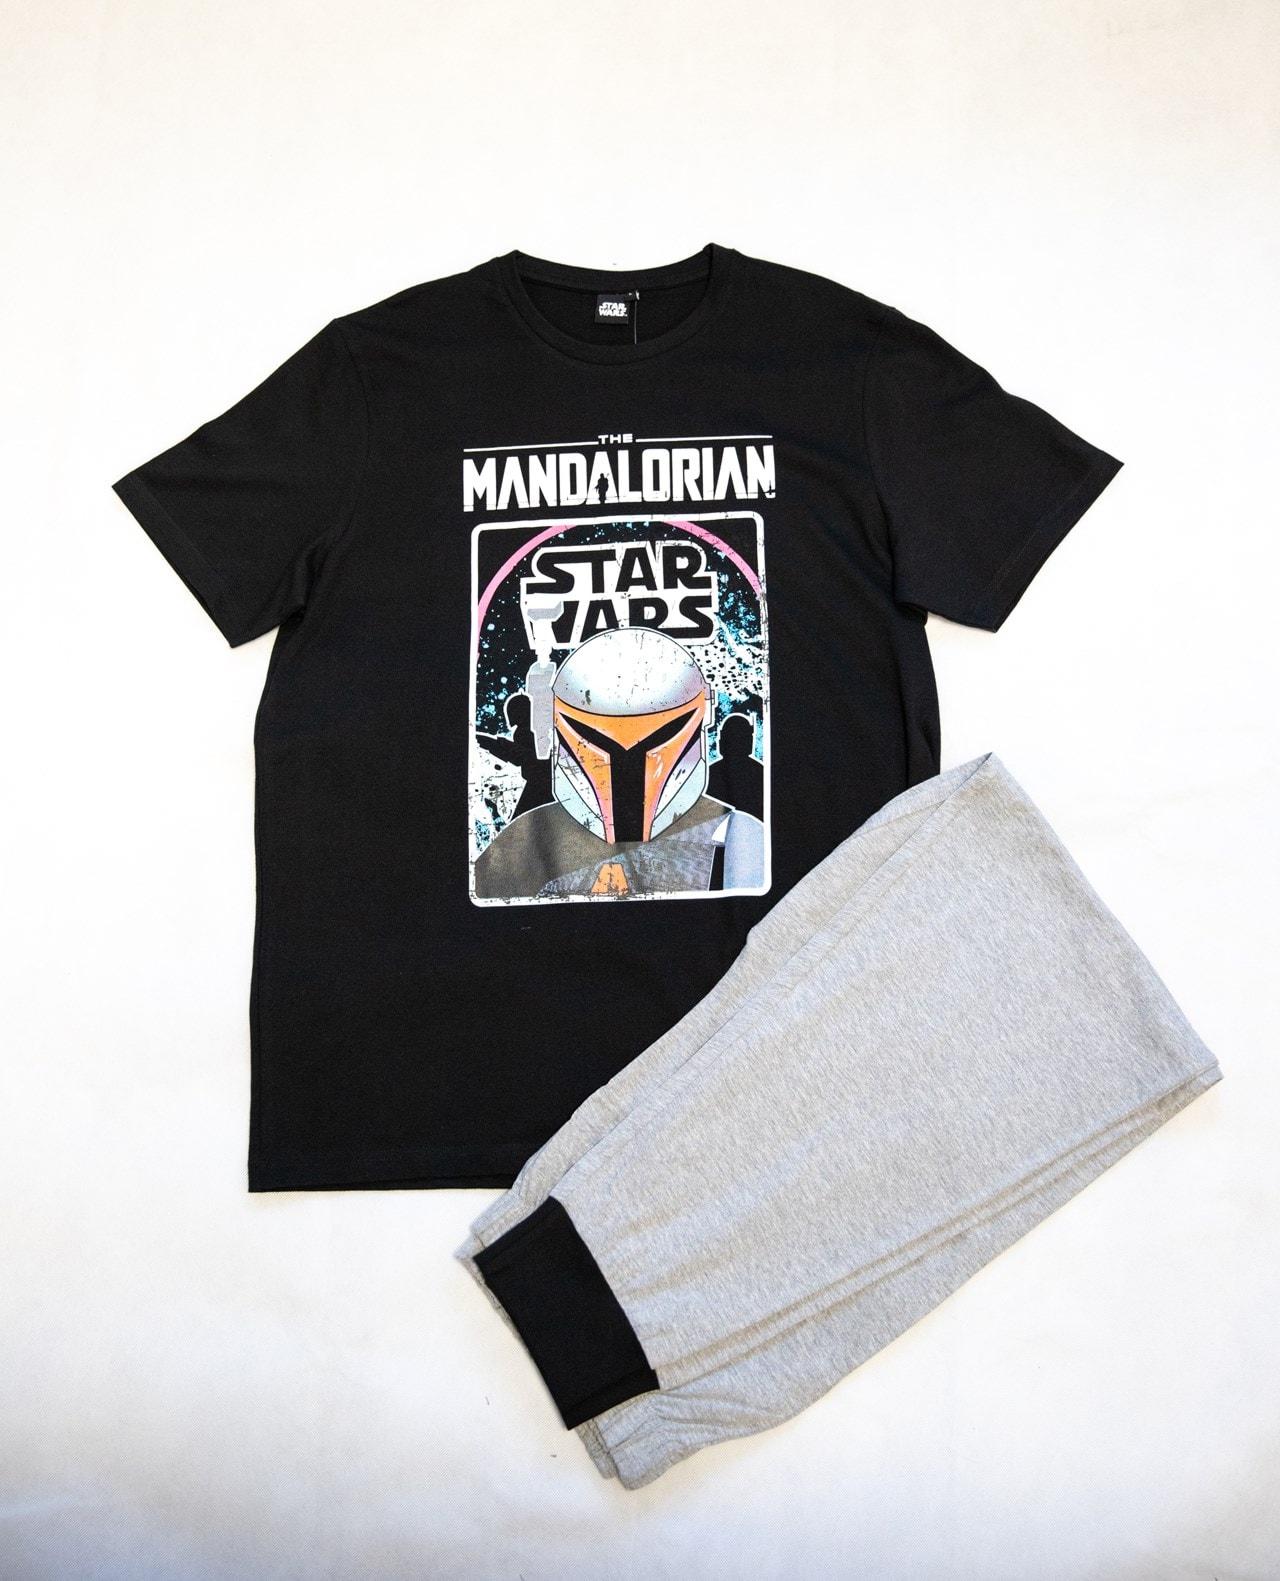 The Mandalorian: Star Wars Pyjama Set (Small) - 2